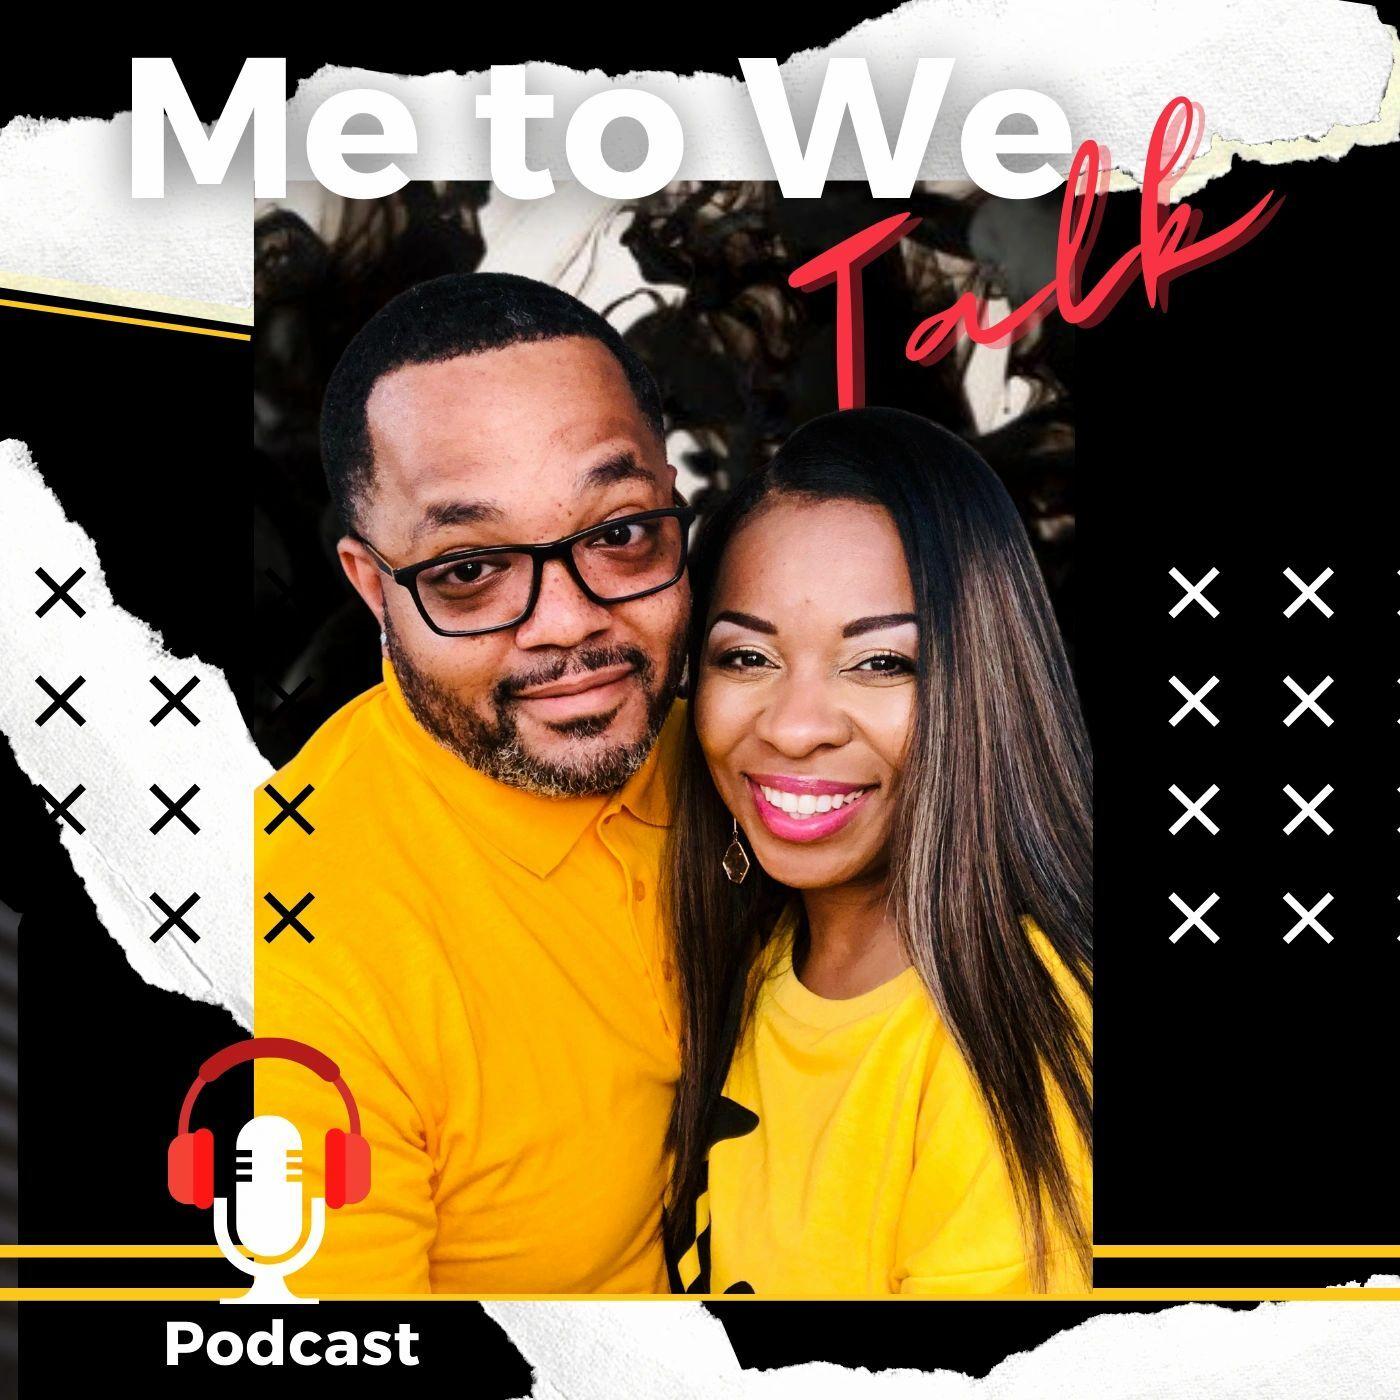 Episode 65: Transfer of Power...in Relationships!